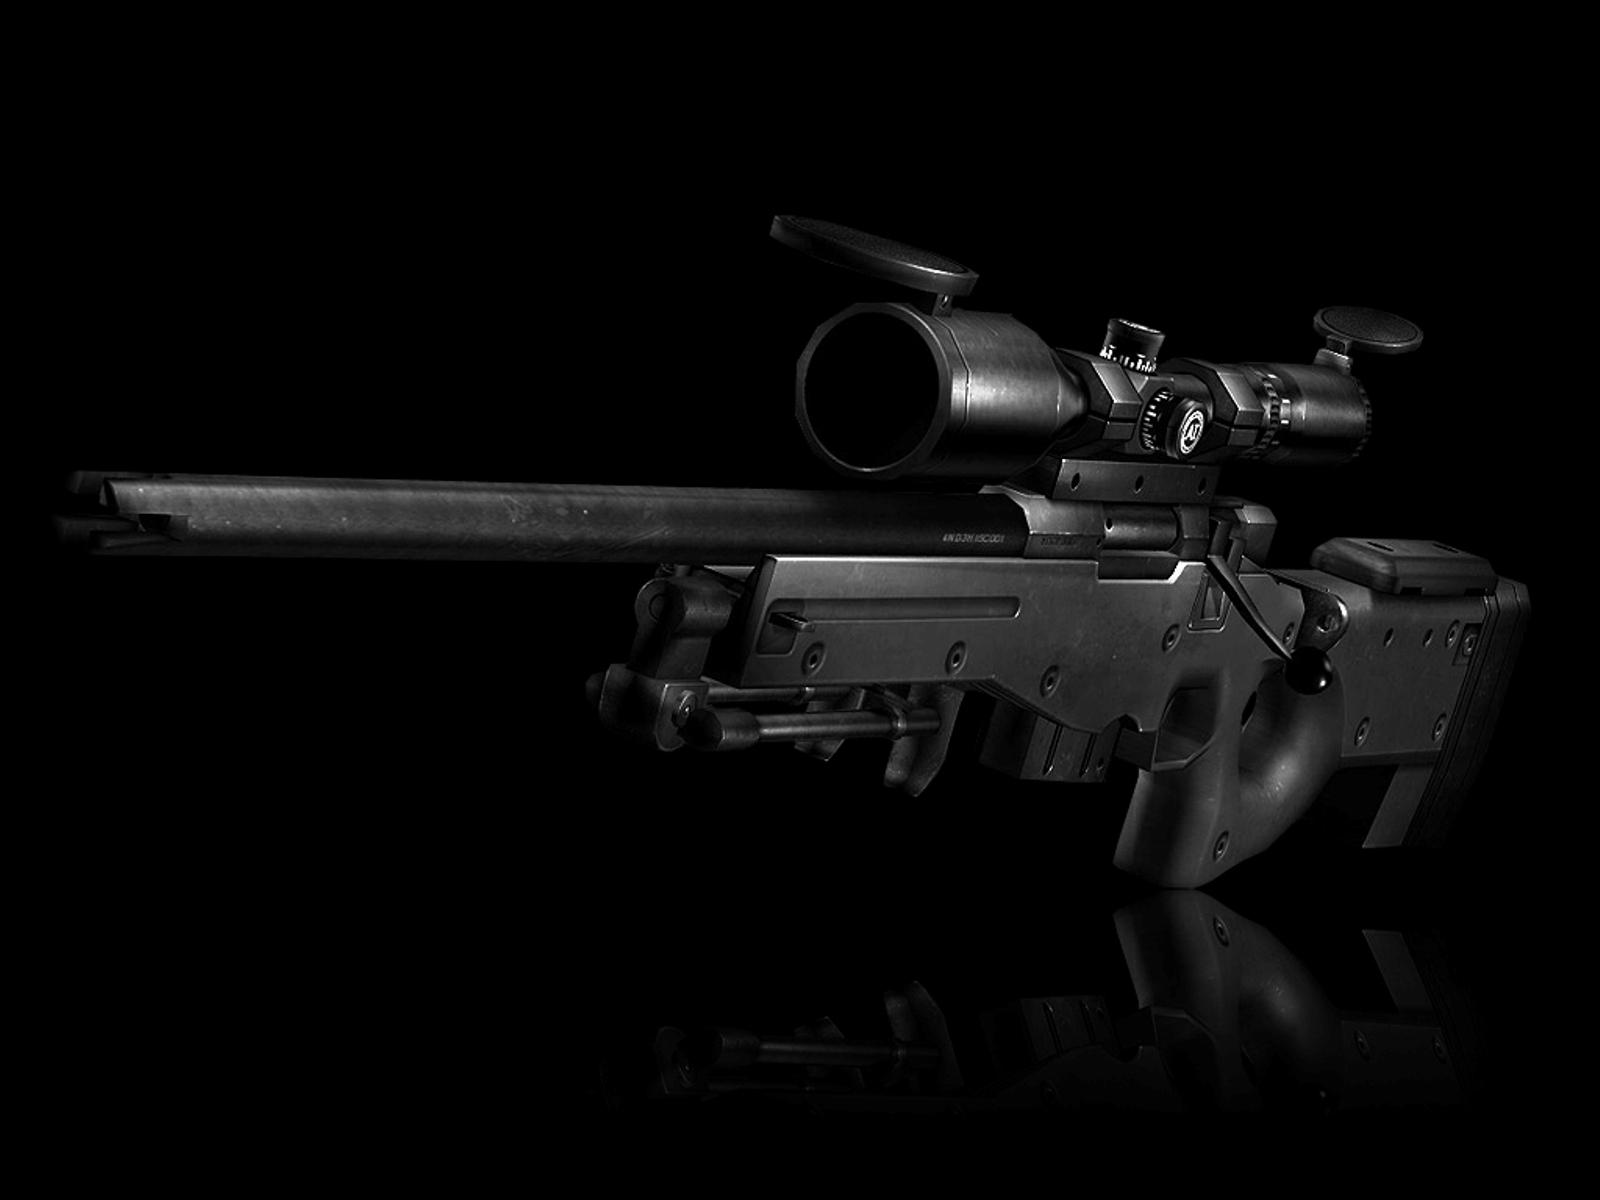 sniper wallpaper background 1600x1200